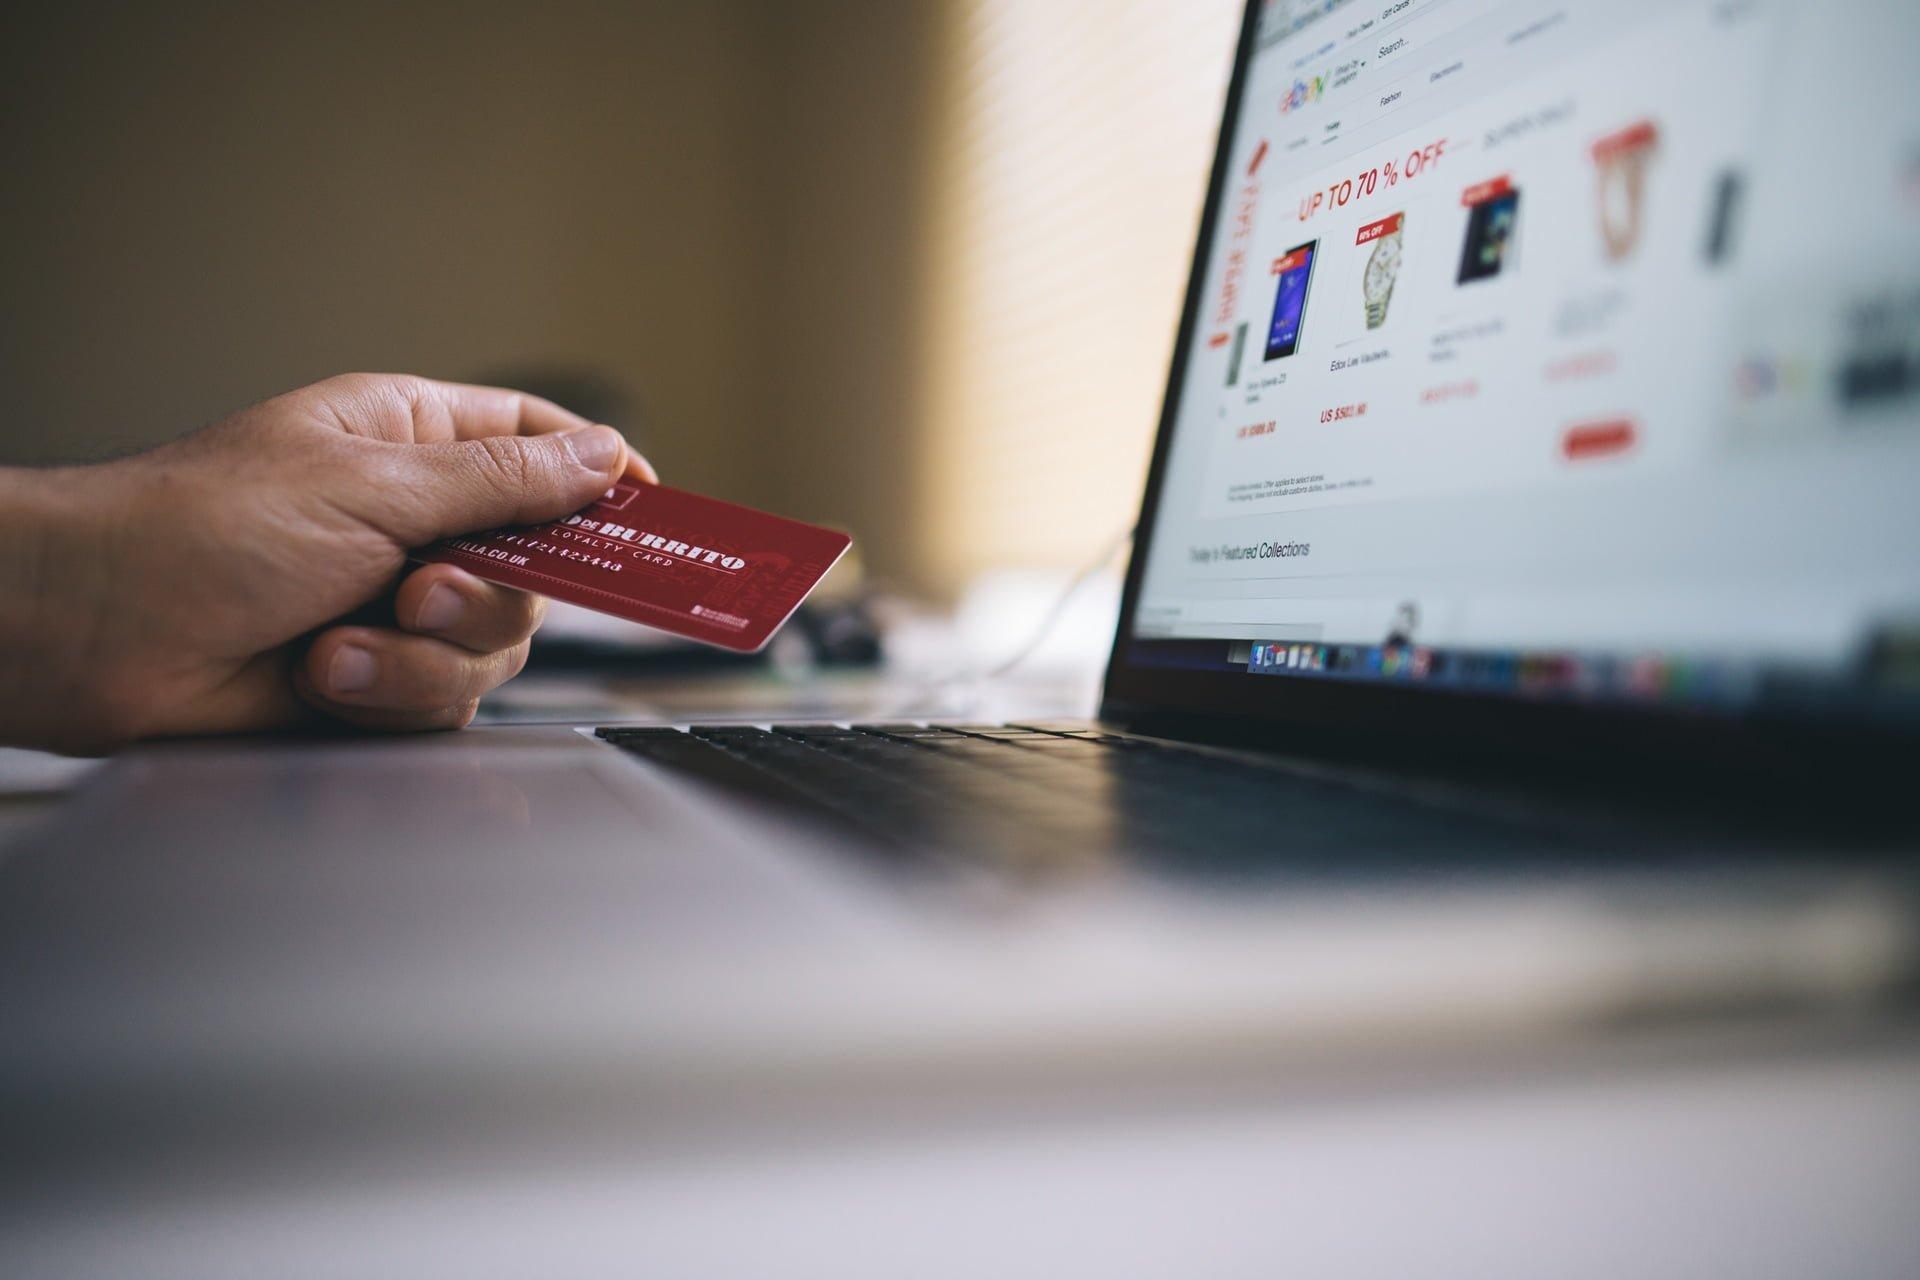 working macbook computer keyboard shopping creditcard 信用卡無法正常順利刷卡消費有哪些原因?